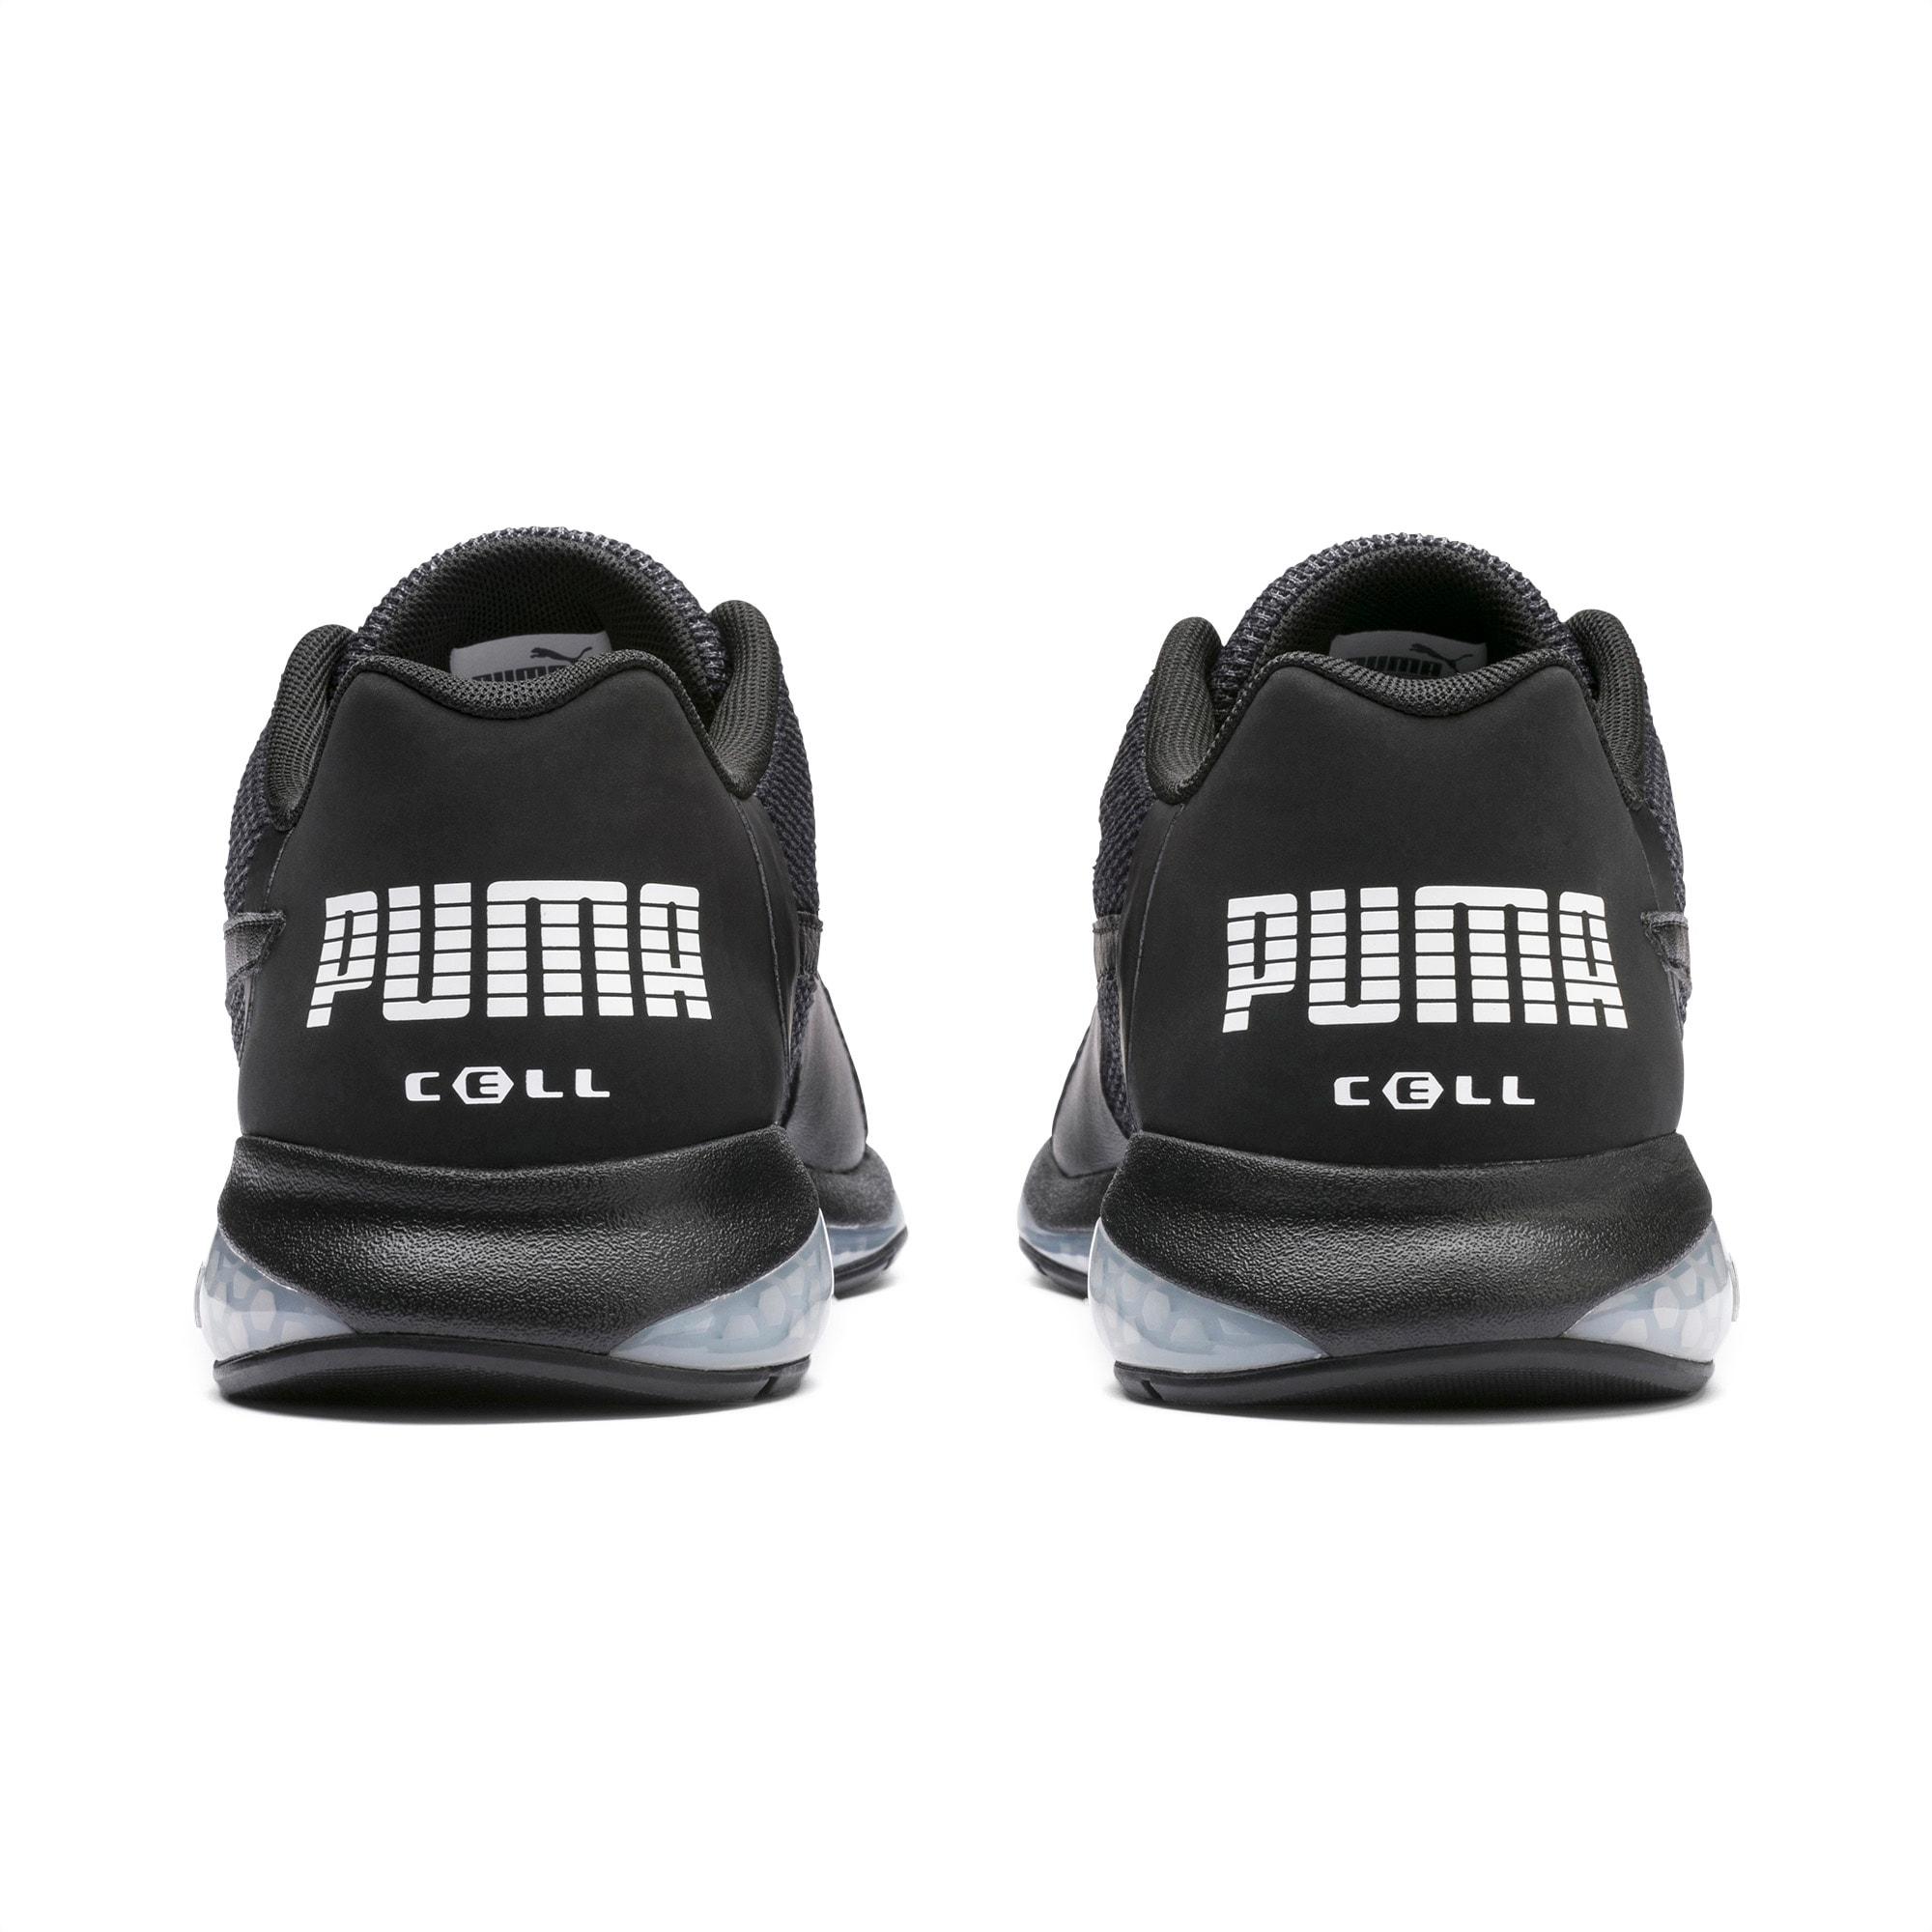 Kaufen 2019 Puma Cell Ultimate Point Joggingschuhe Herren